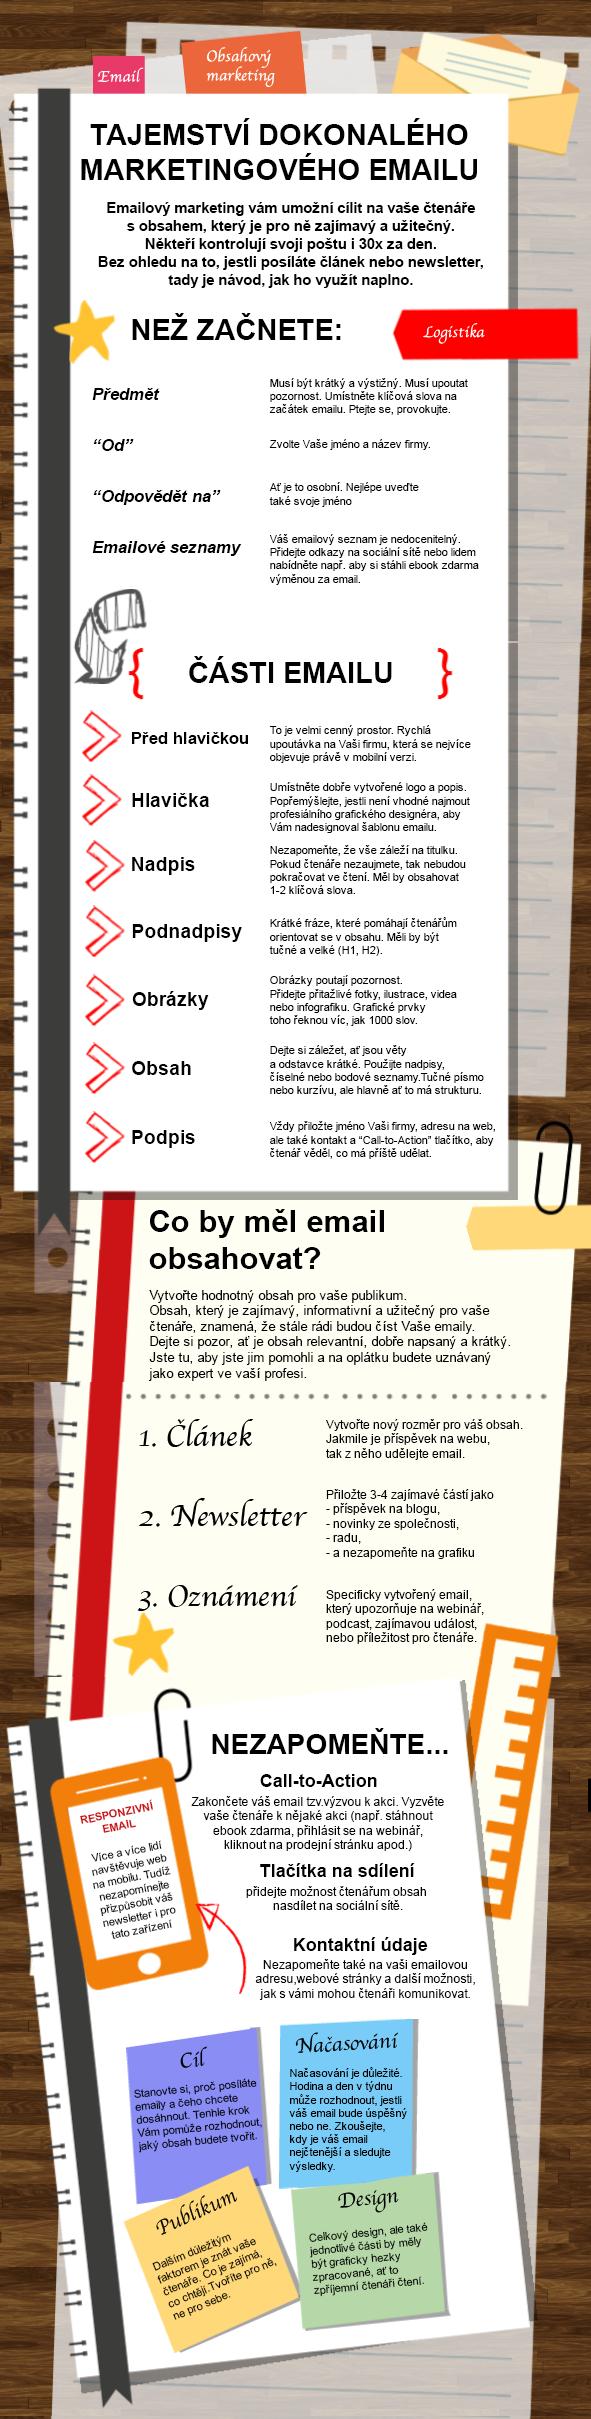 infografika_tajemstvi_dokonaleho_emailu1